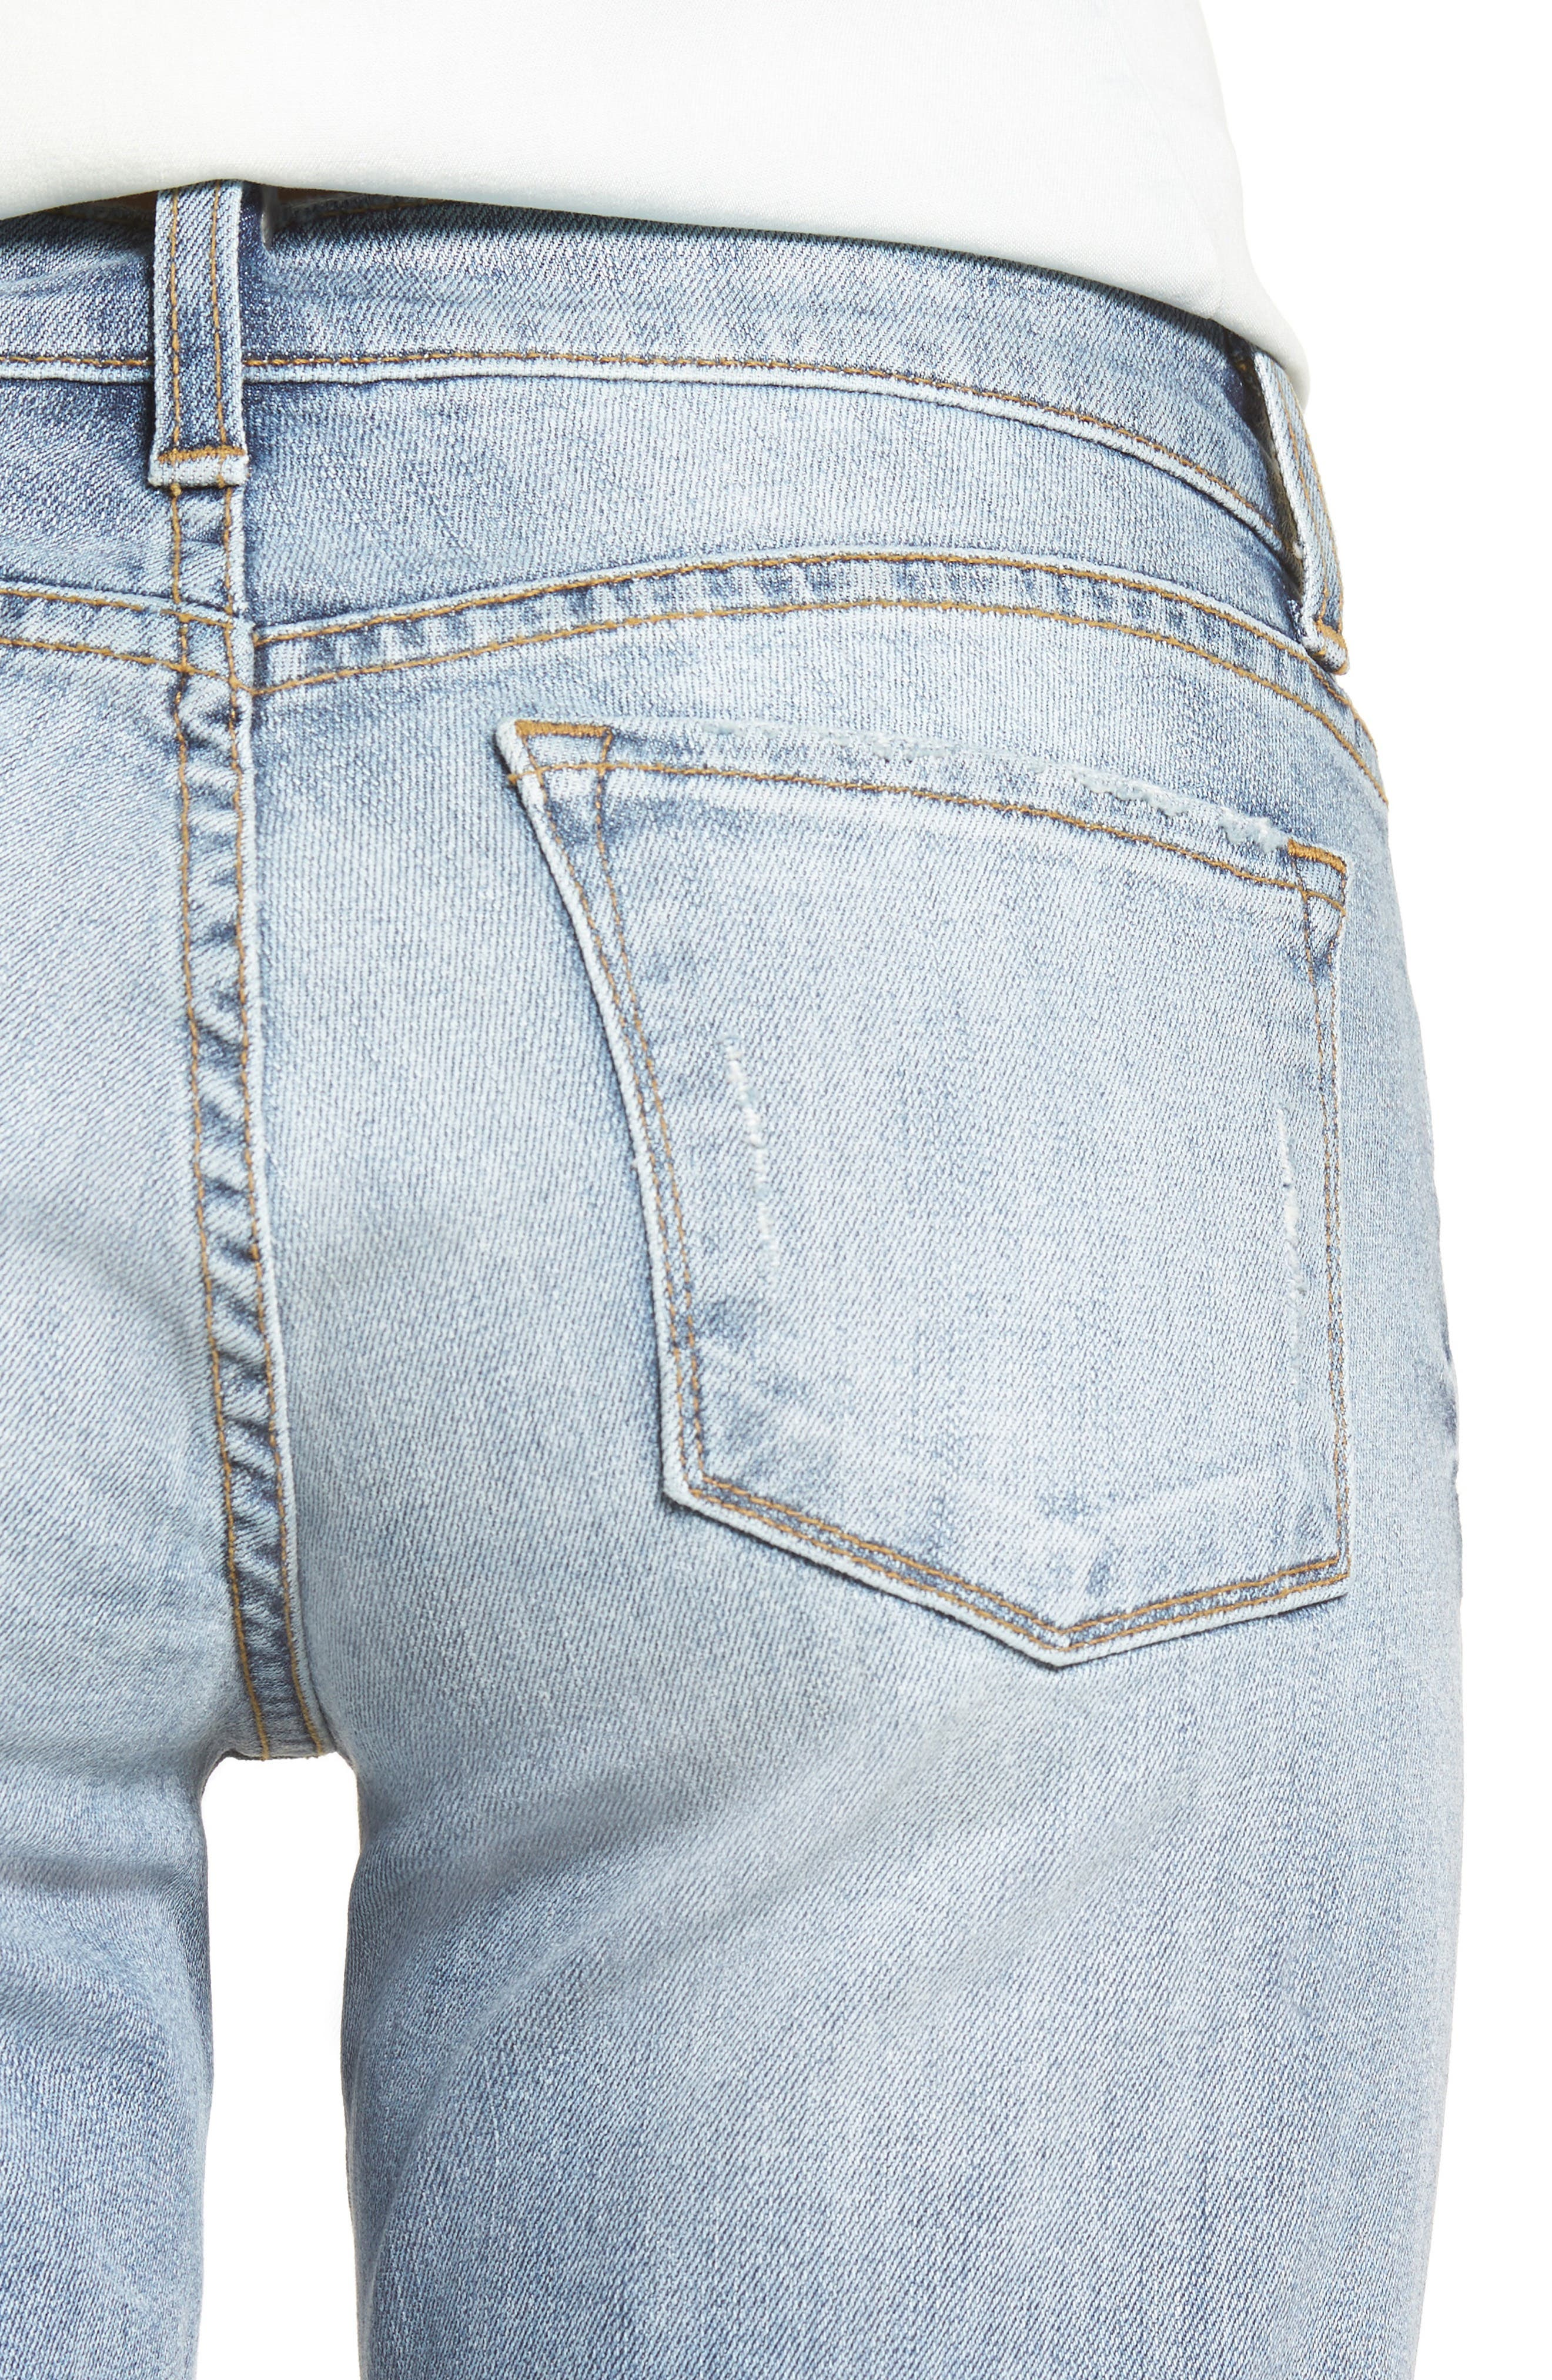 Alternate Image 4  - KUT from the Kloth Catherine Distressed Boyfriend Jeans (Regarded) (Regular & Petite)